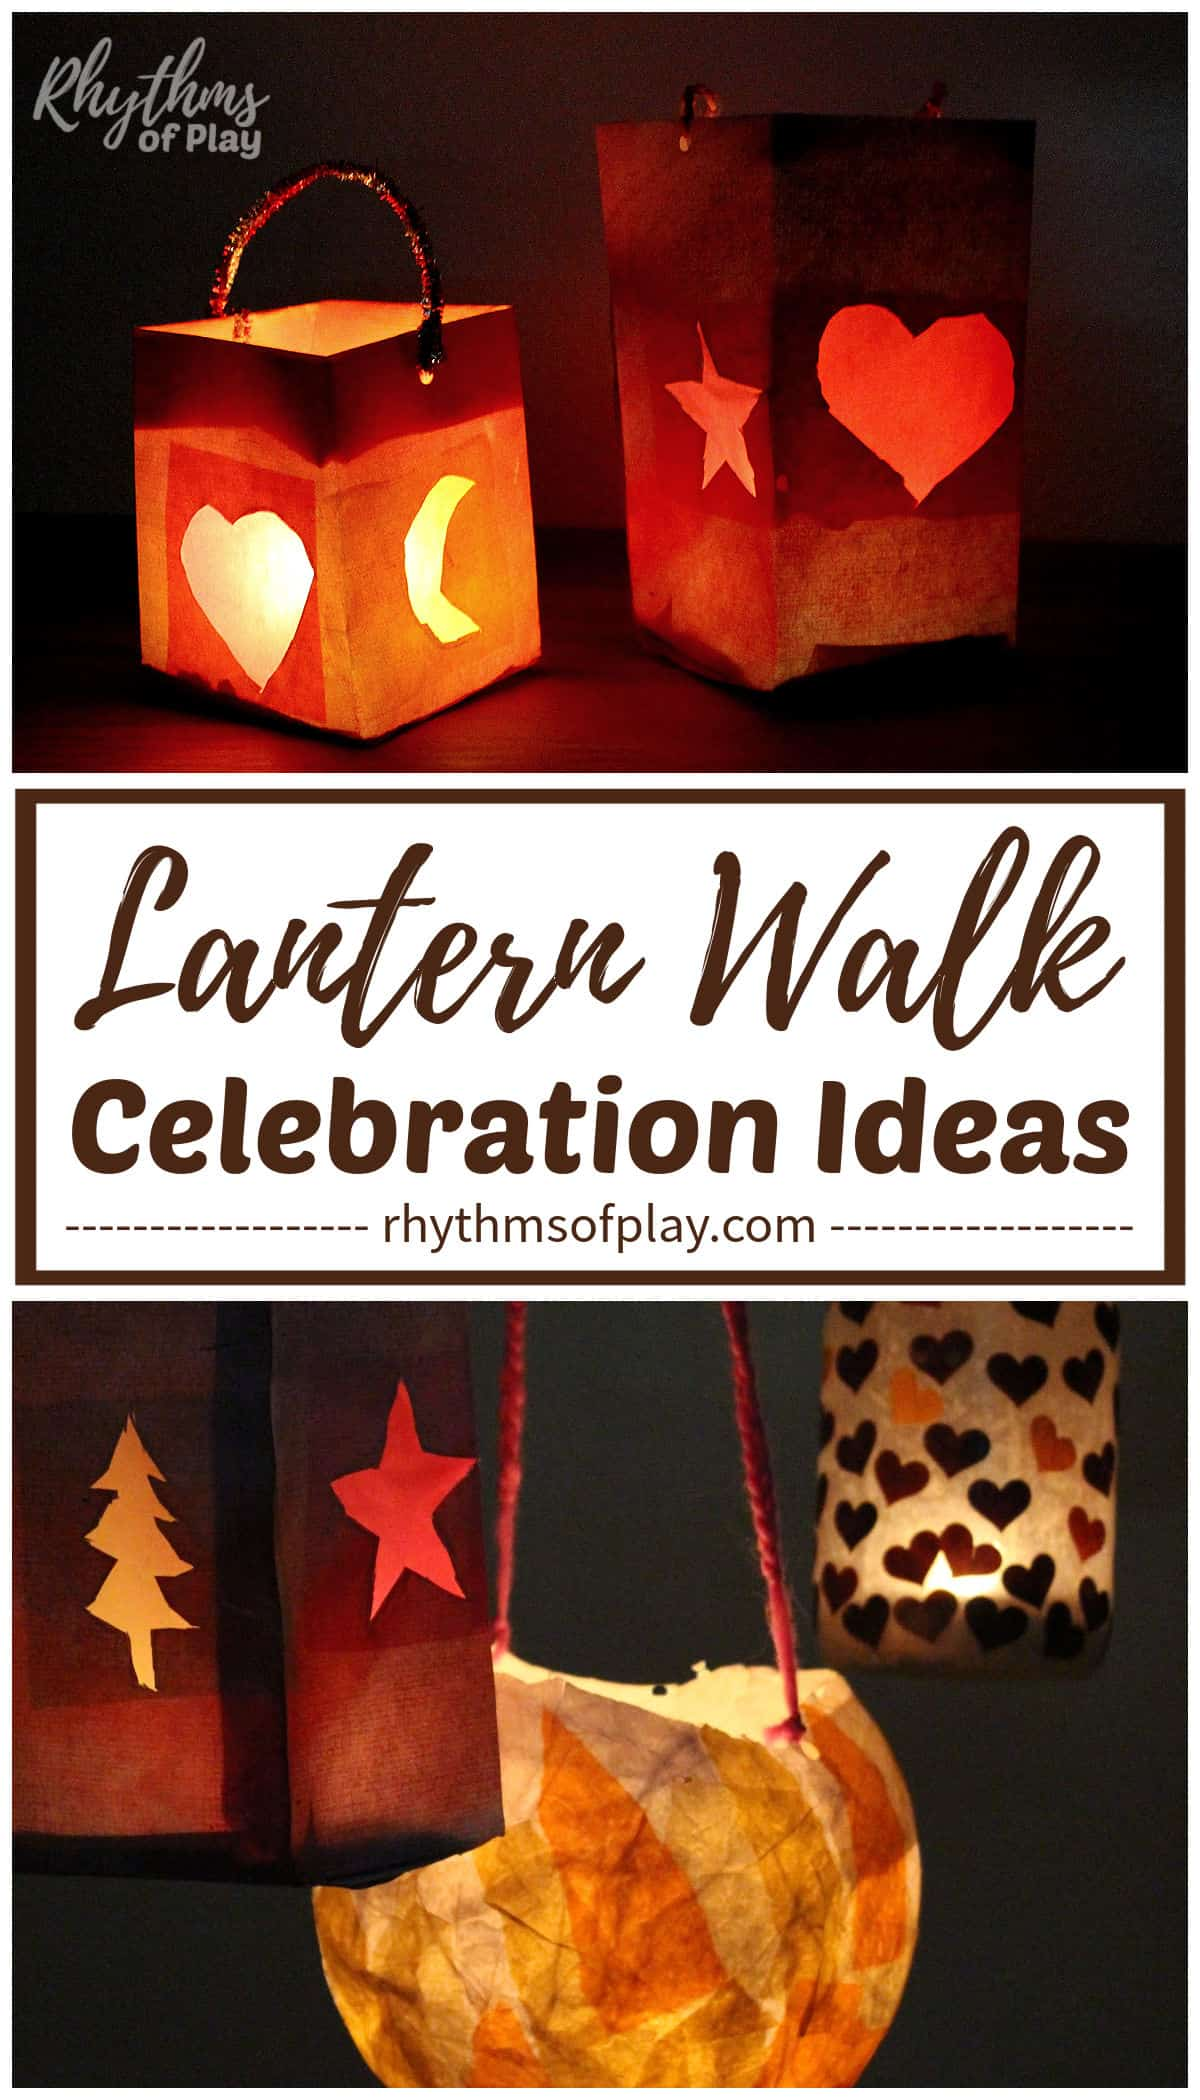 Waldorf lantern craft ideas for Martinmas lantern walk.